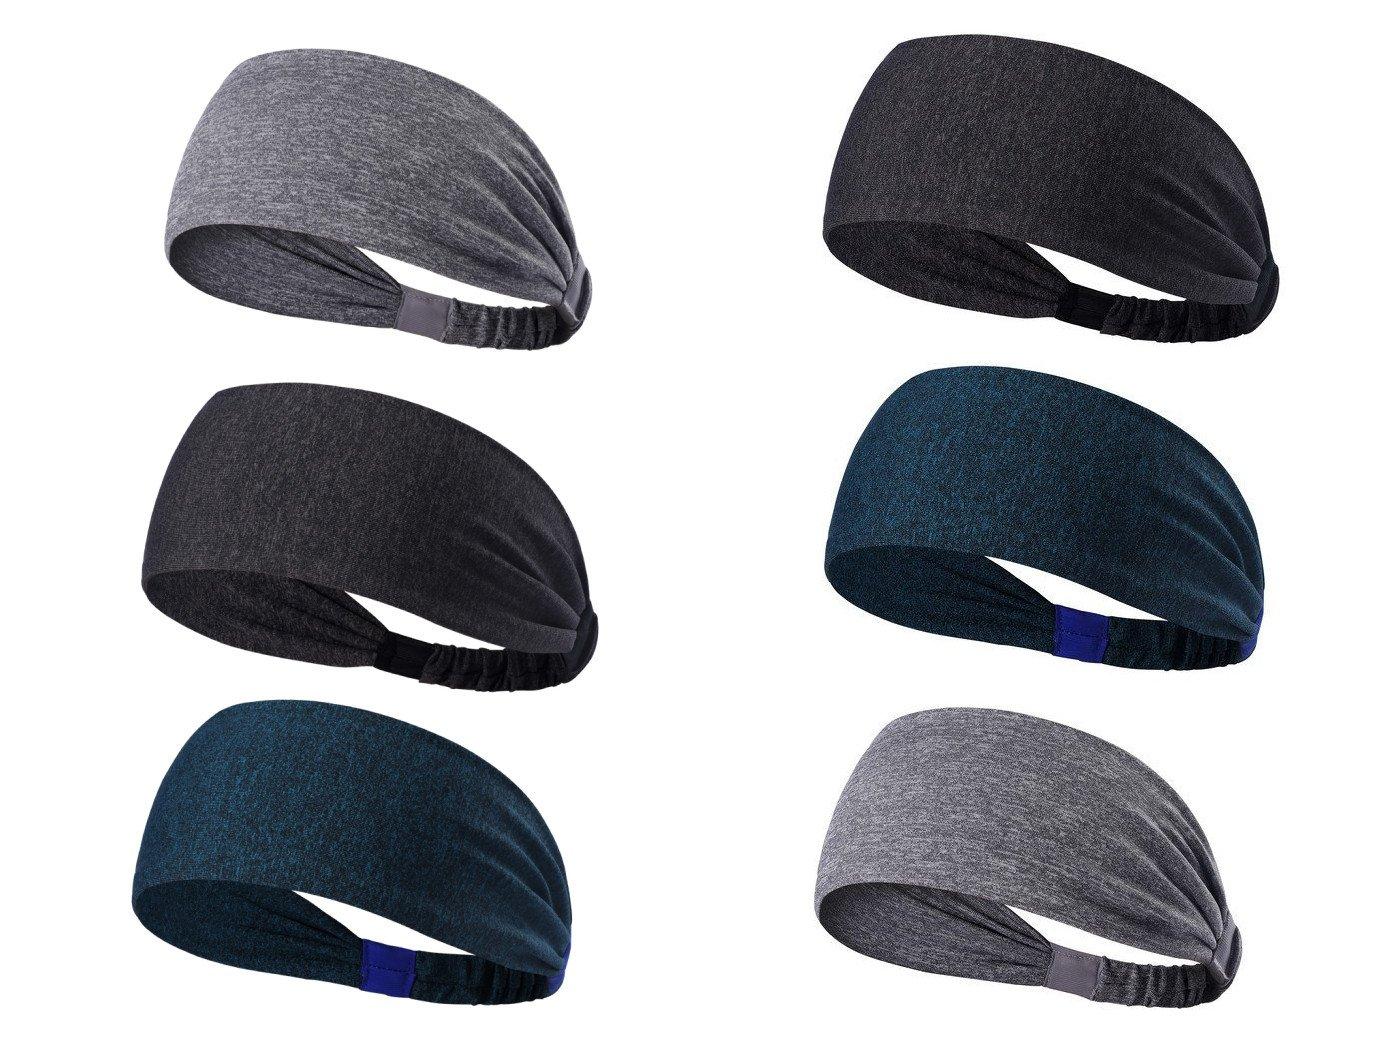 53b53b270 MLB Replica Adult Baseball Cap Various Team Trucker Hat Adjustable ...